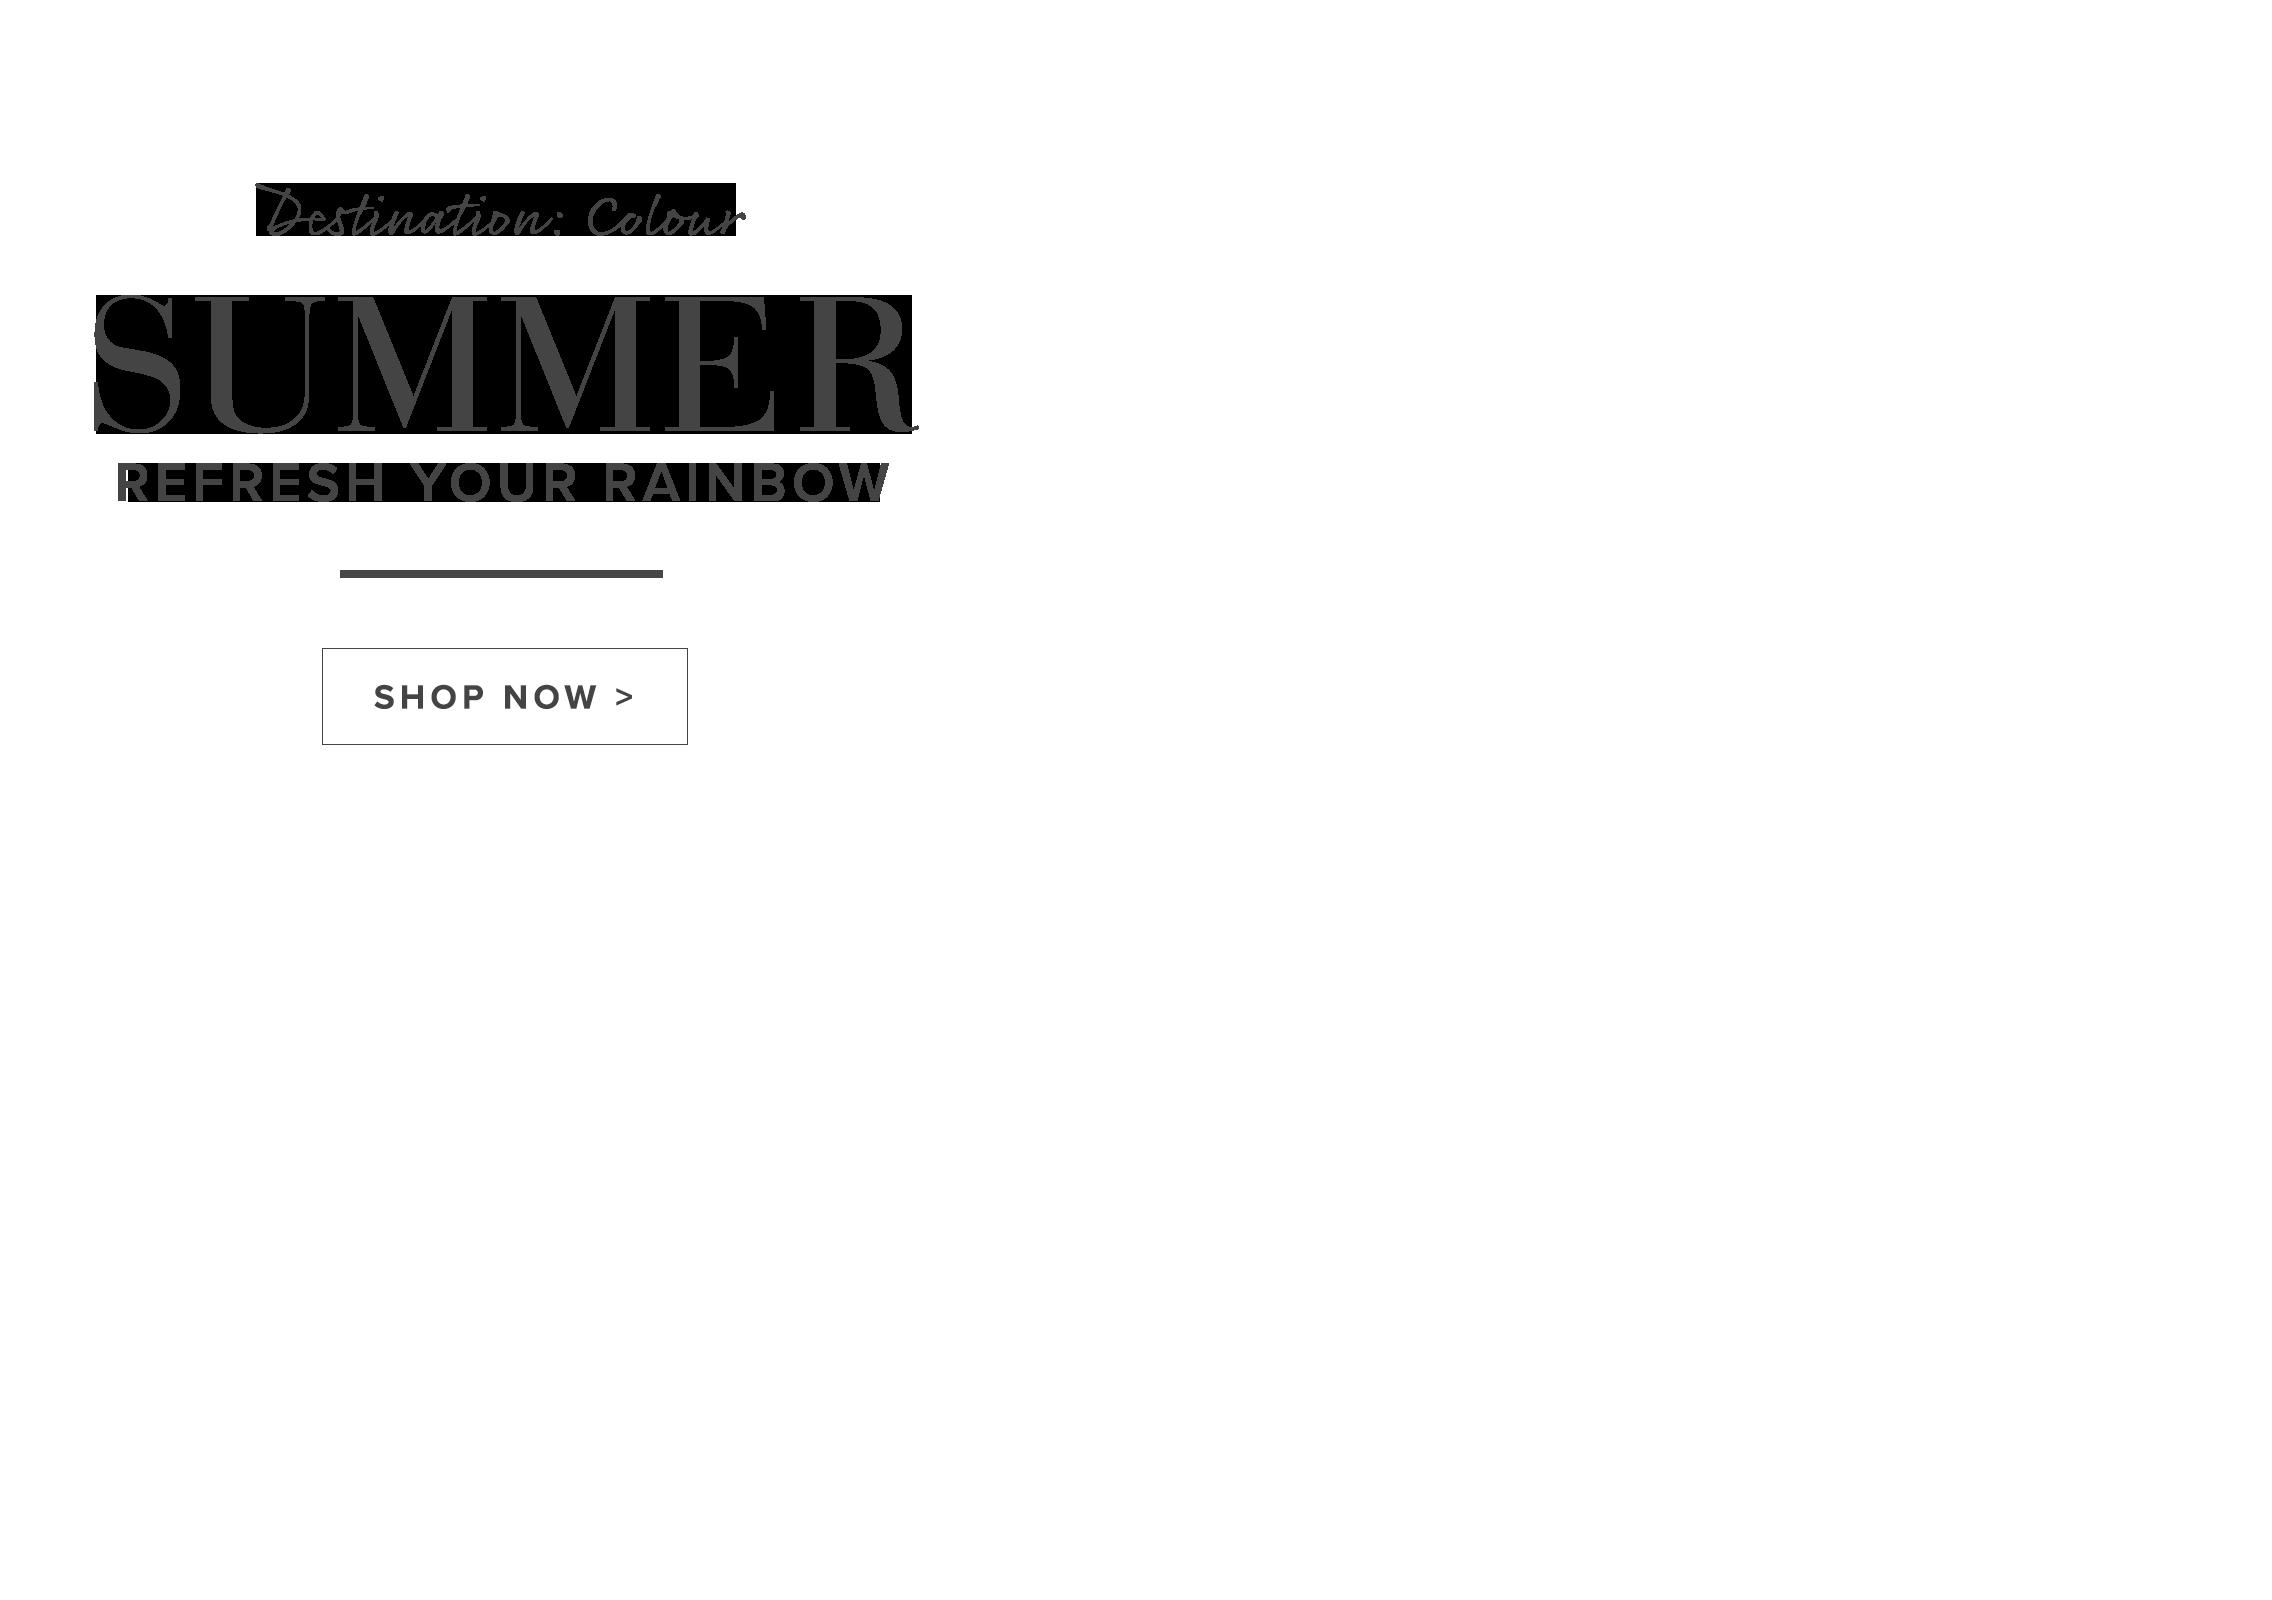 raw-main_overlay_ss19_summer_b_usa.png